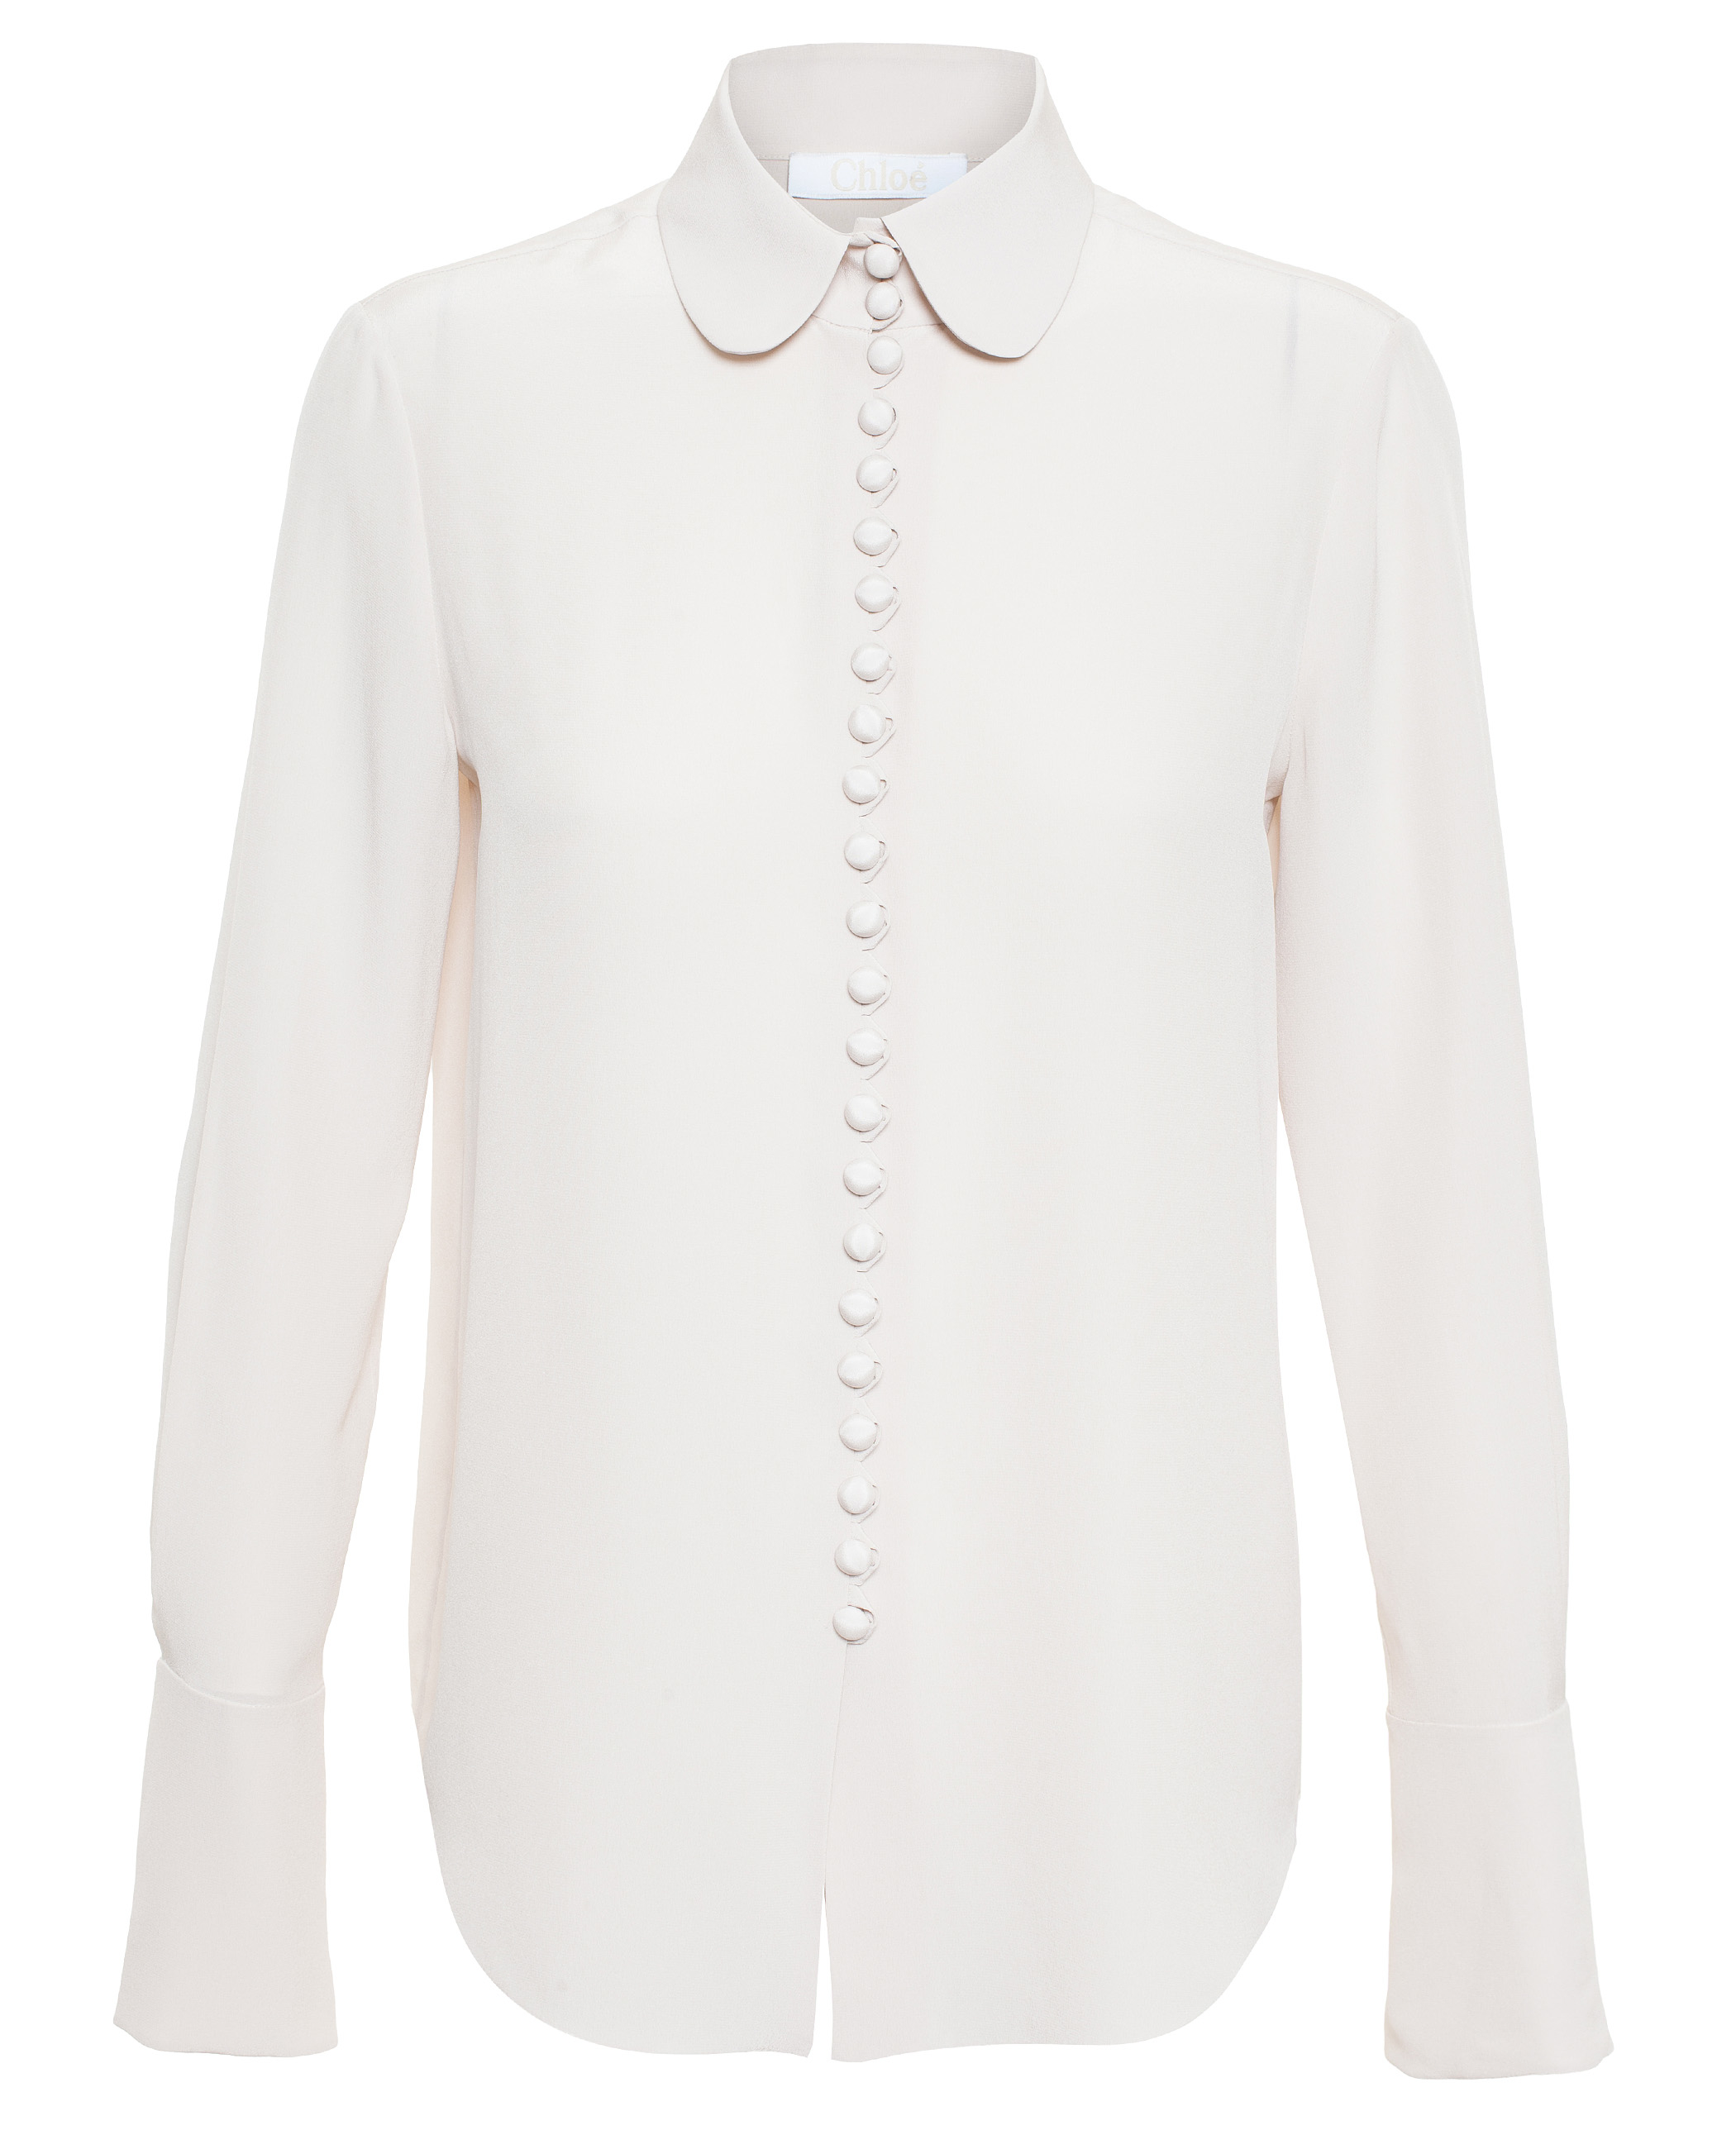 Chloé button down shirt Free Shipping How Much cC32nZnVUh